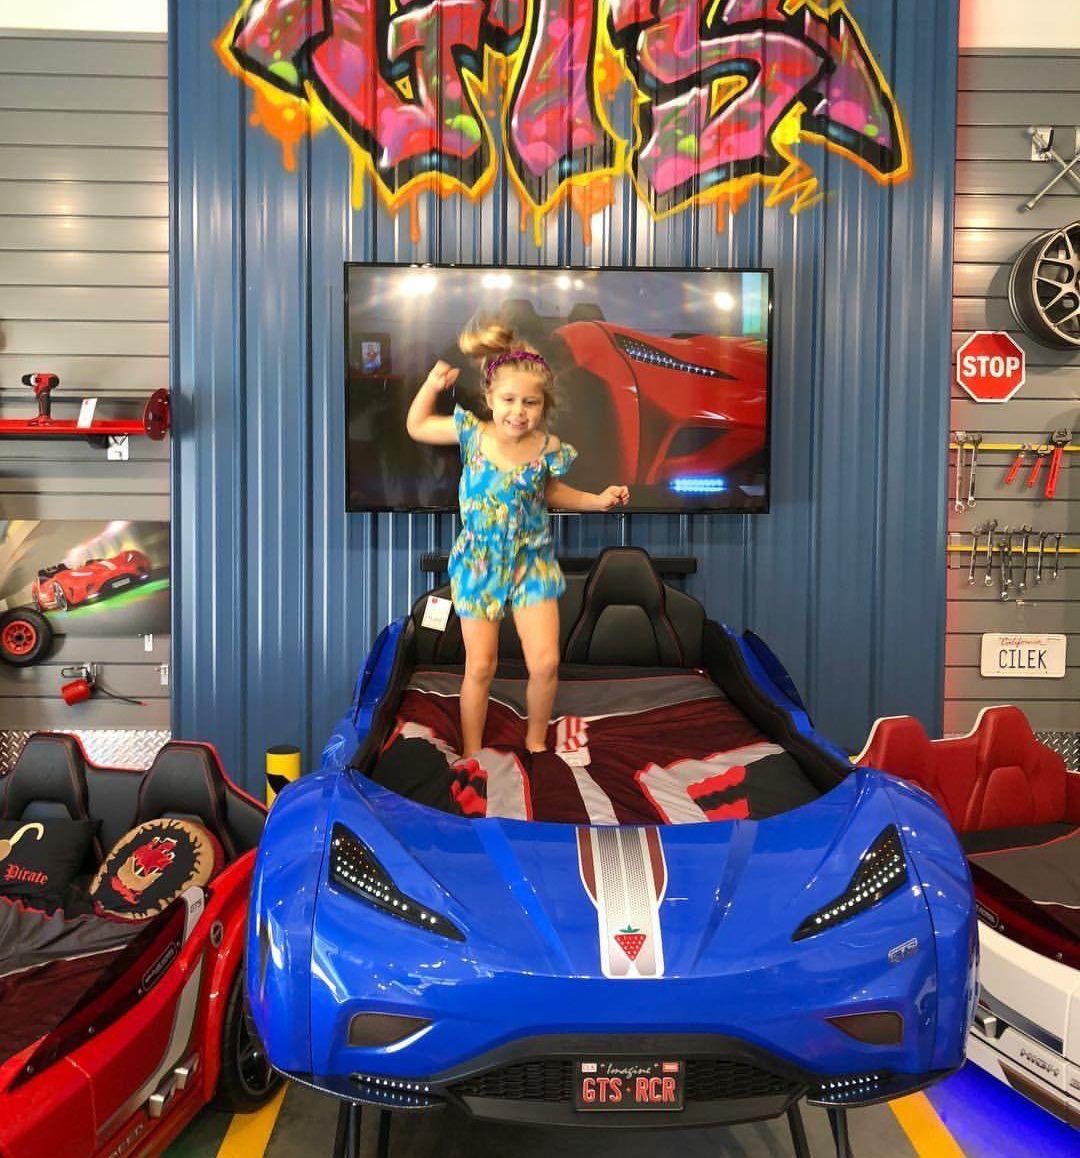 Cilek Kids car bed, Kid beds, Modern baby gear